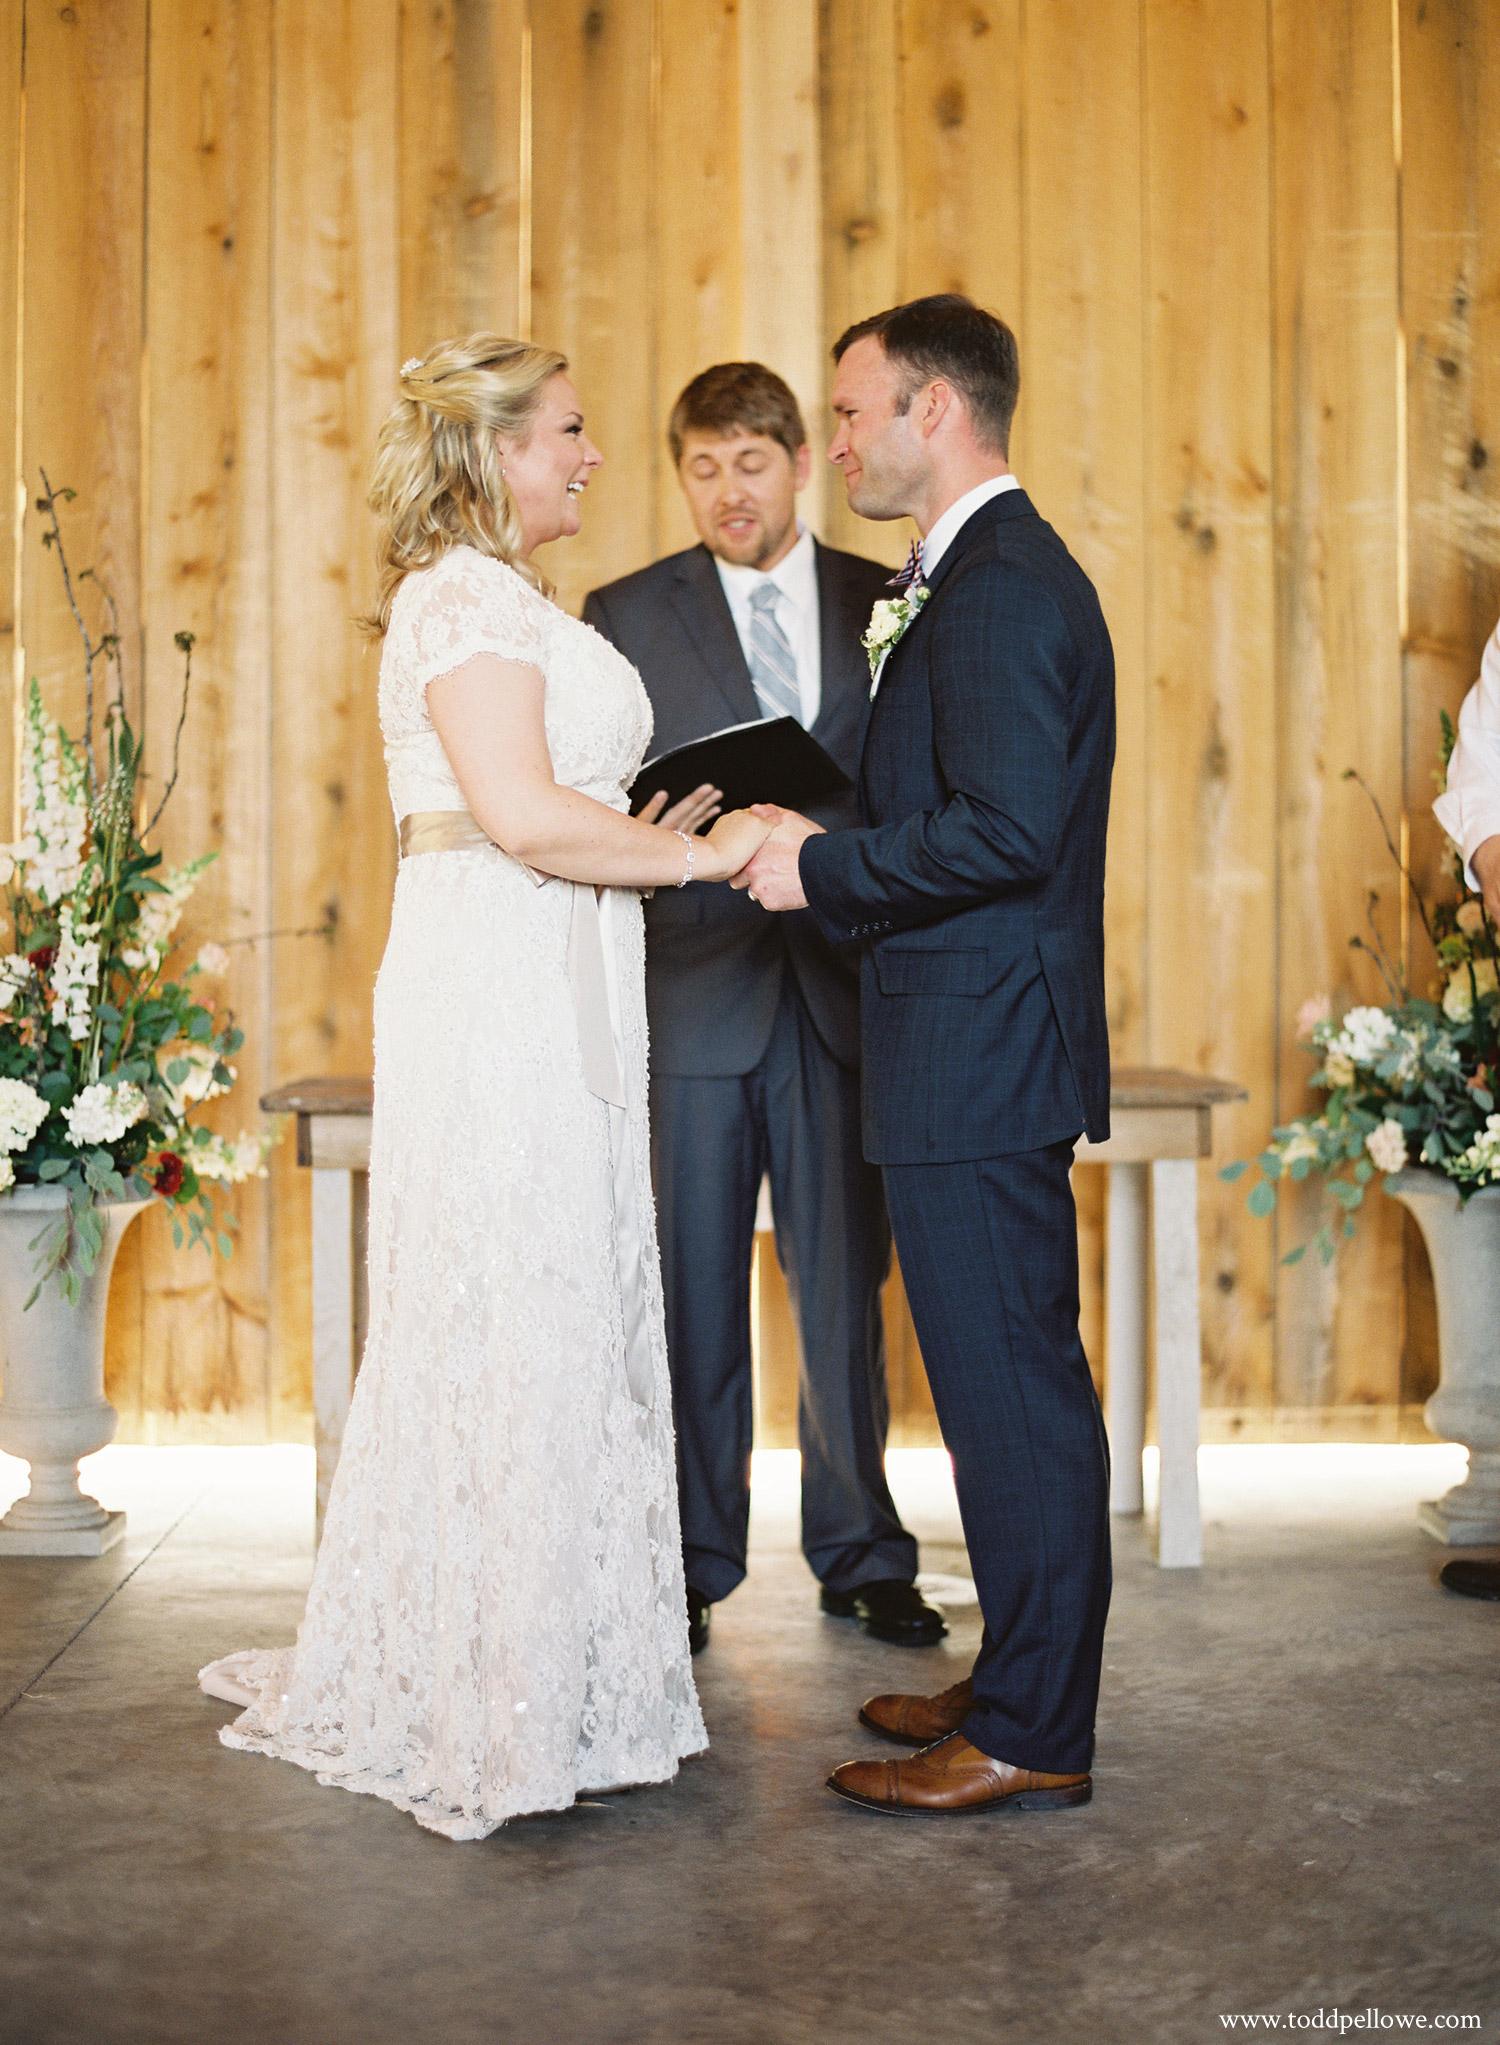 22-long-ridge-farm-wedding-shelbyville-002.jpg